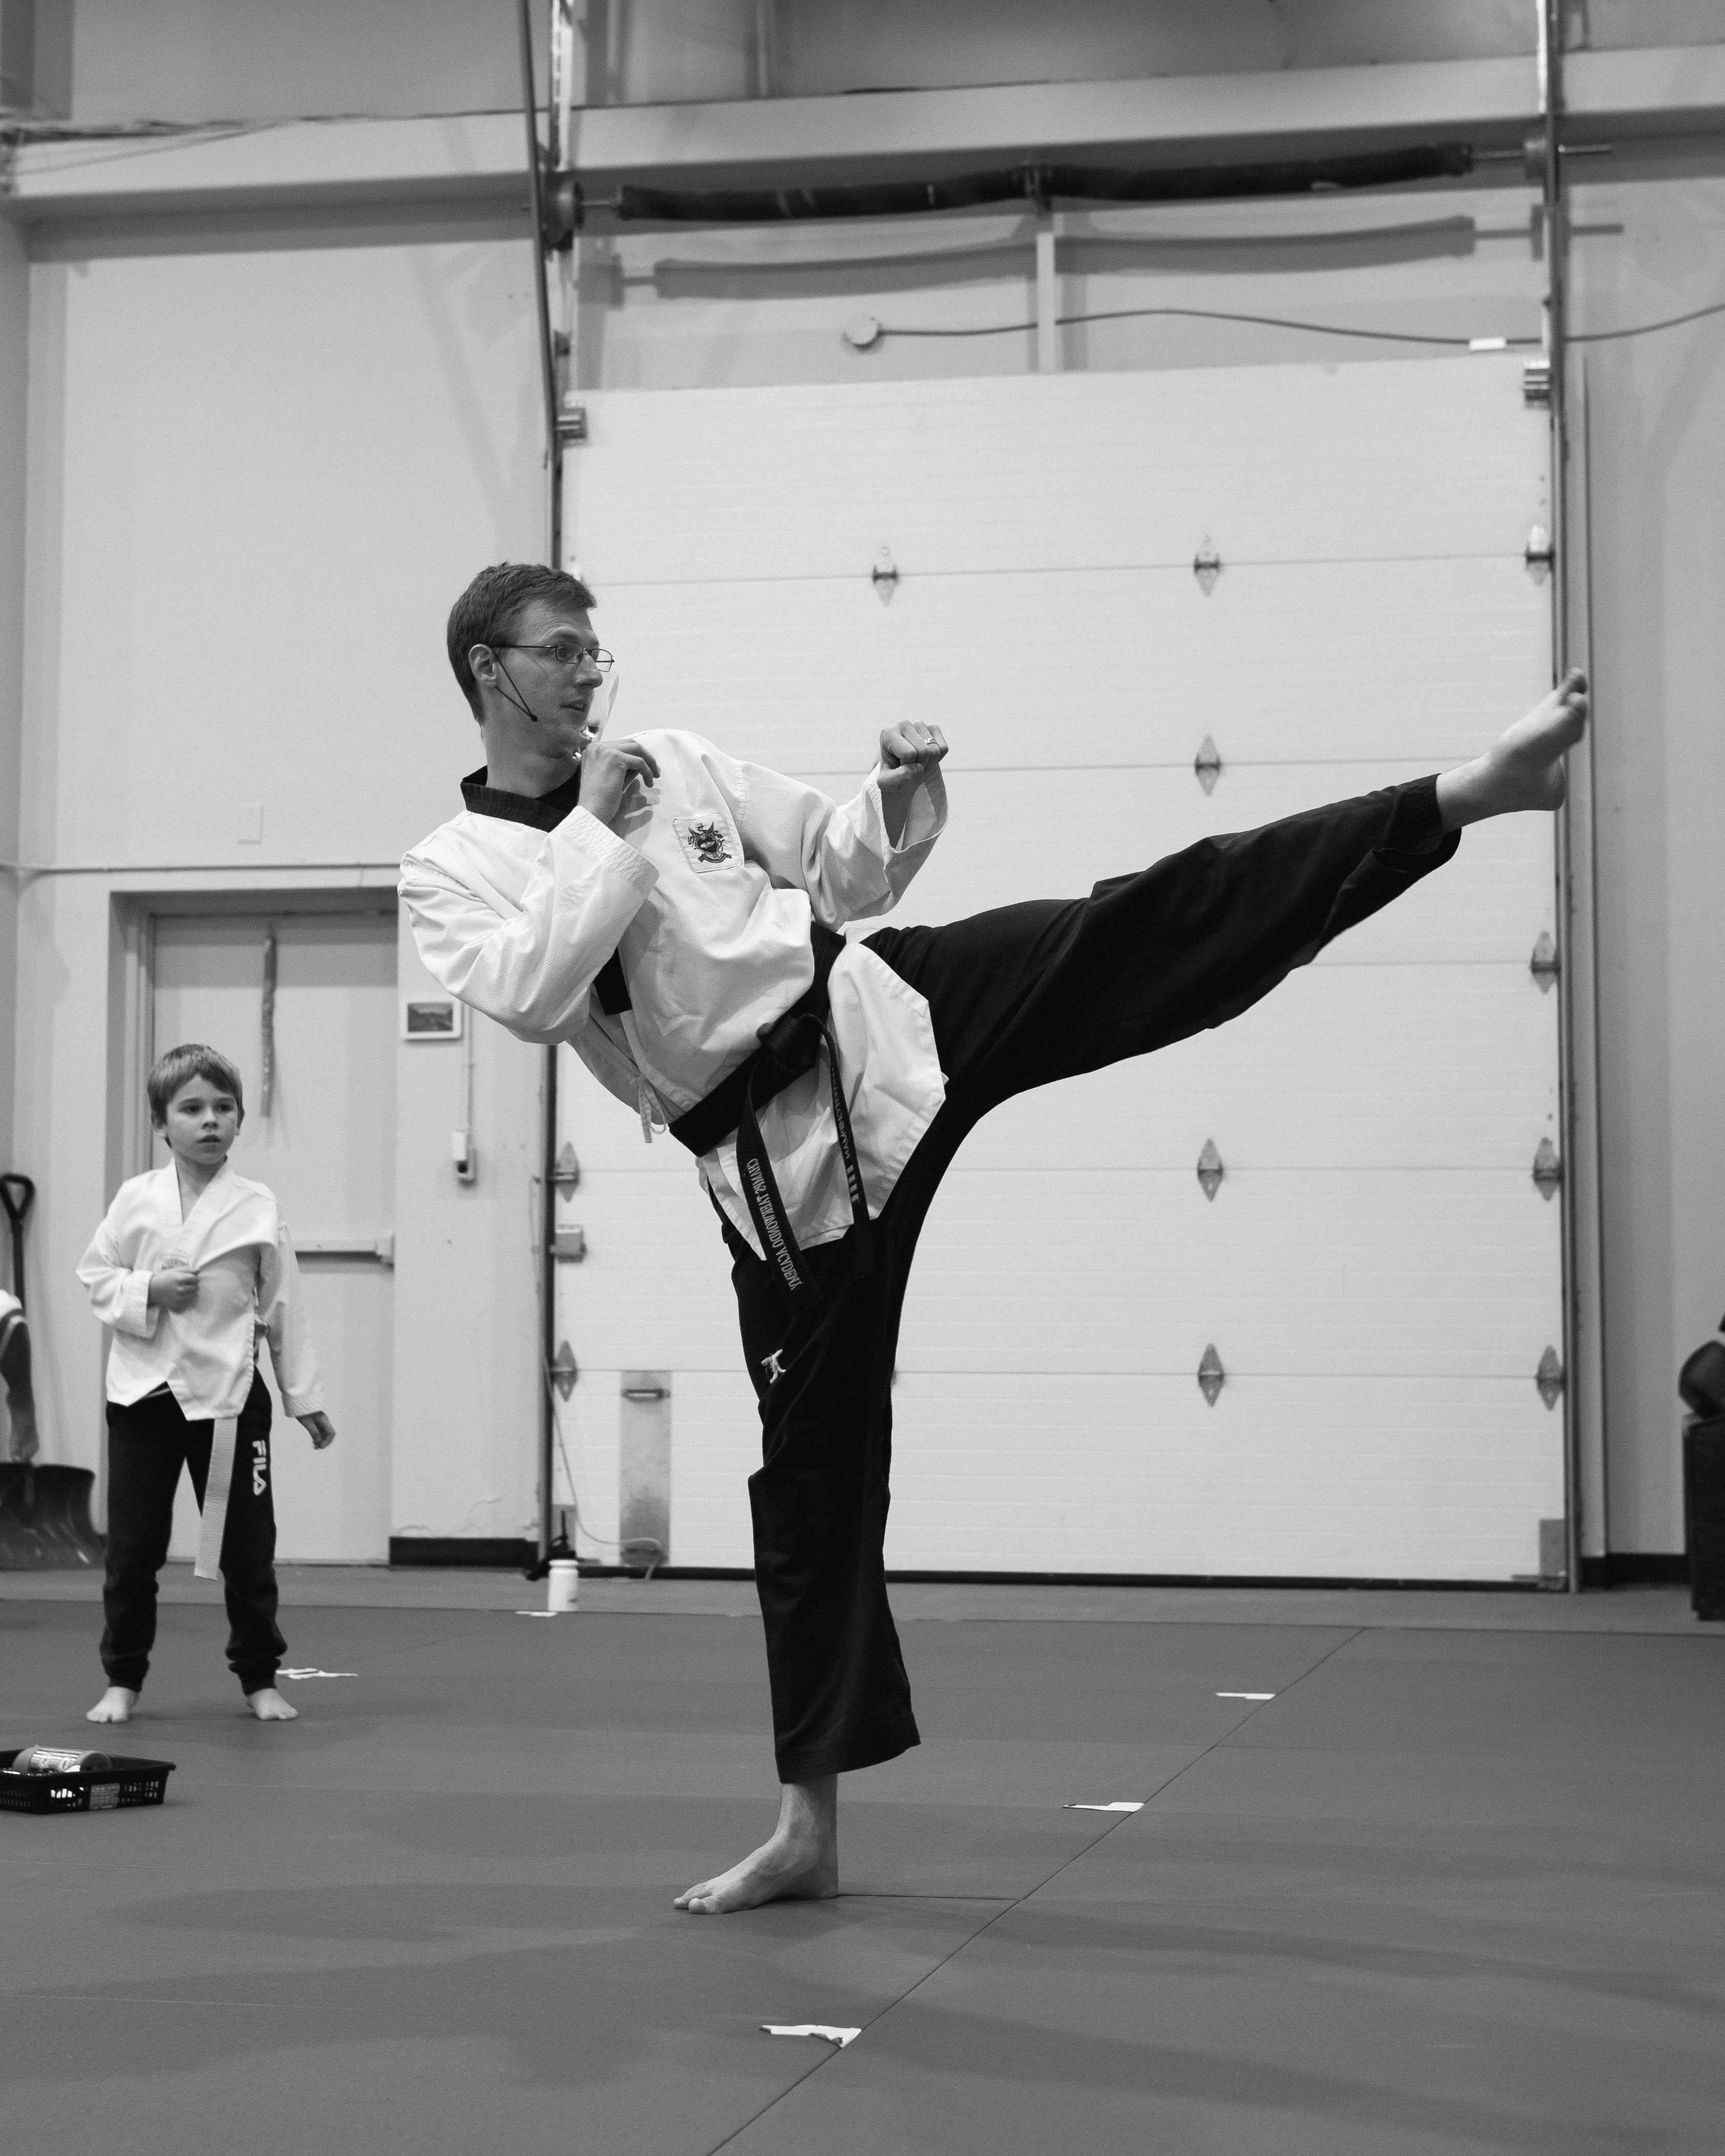 A teacher teaching Taekwondo to kids